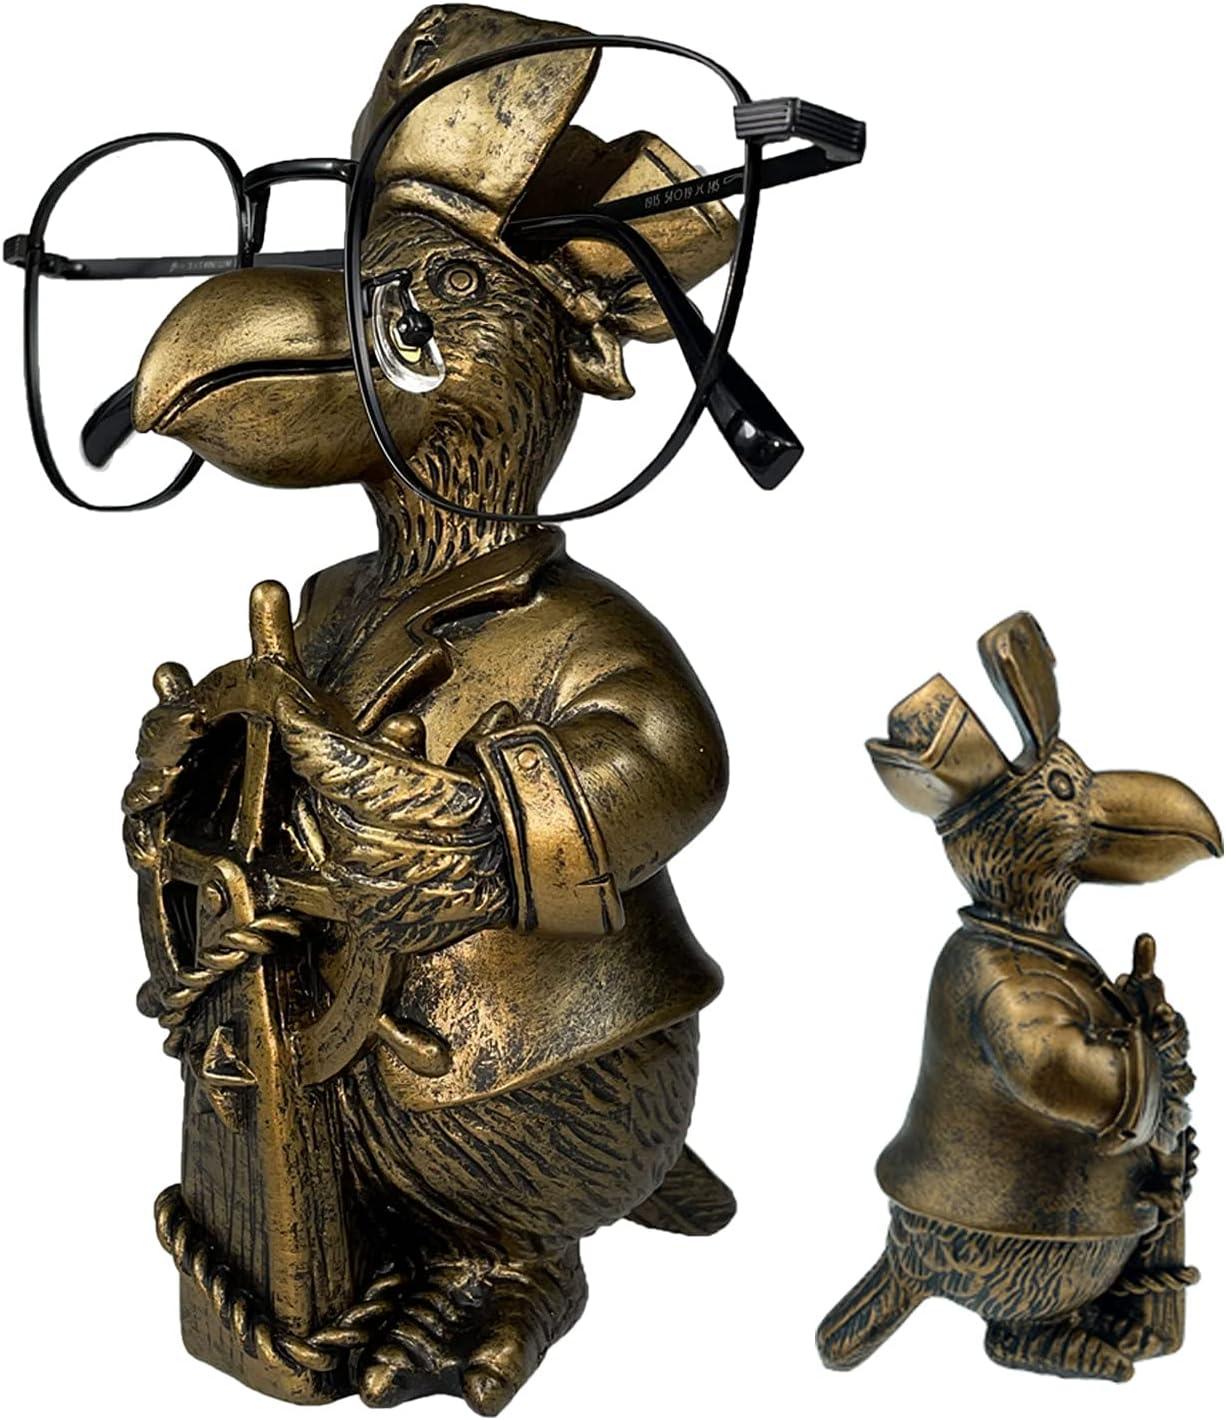 UOYEET Eyeglass Holder Stand, Handmade Decorative Eye Glasses Holders for Desk, Eyeglasses Accessories Organizer for Home Office